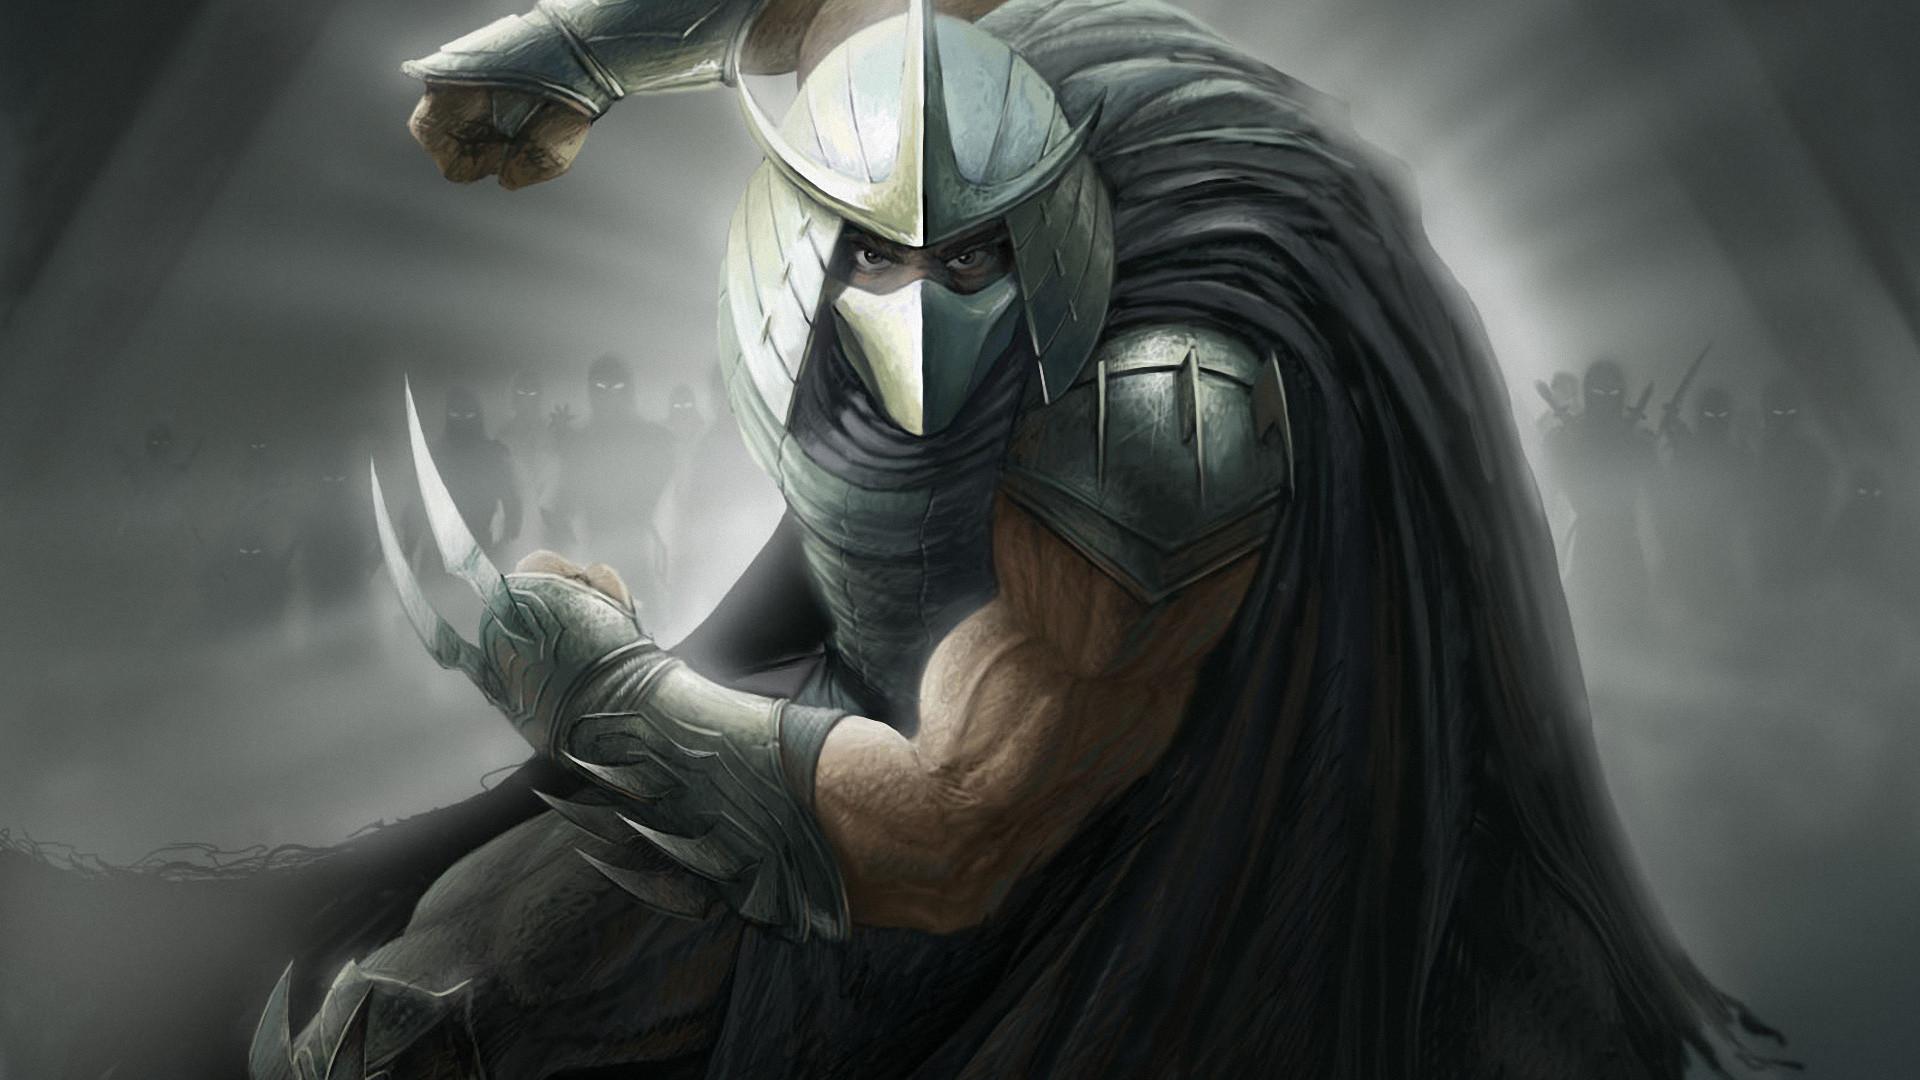 Ninja Art Wallpaper 69 Images